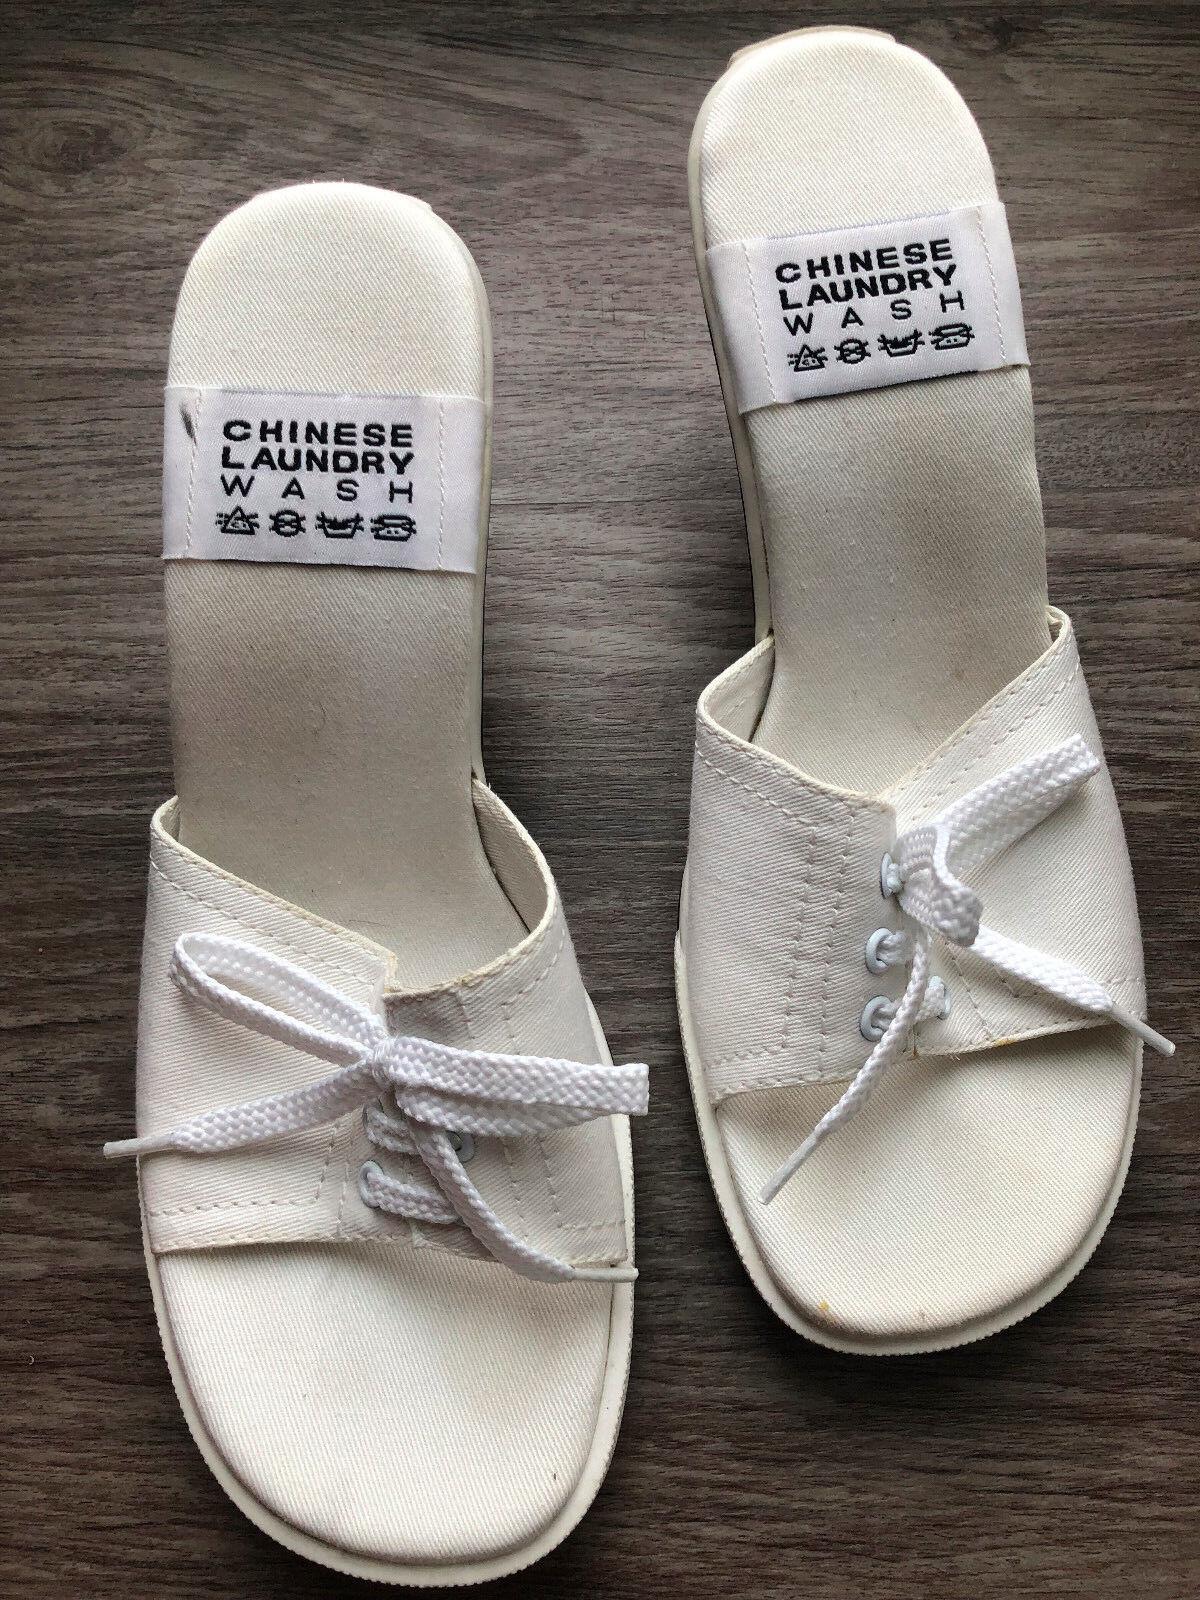 CHINESE LAUNDRY Women's White 'Cat Walk' Mule Sneaker NEW Like Sandals Size 7.5 NEW Sneaker 847244